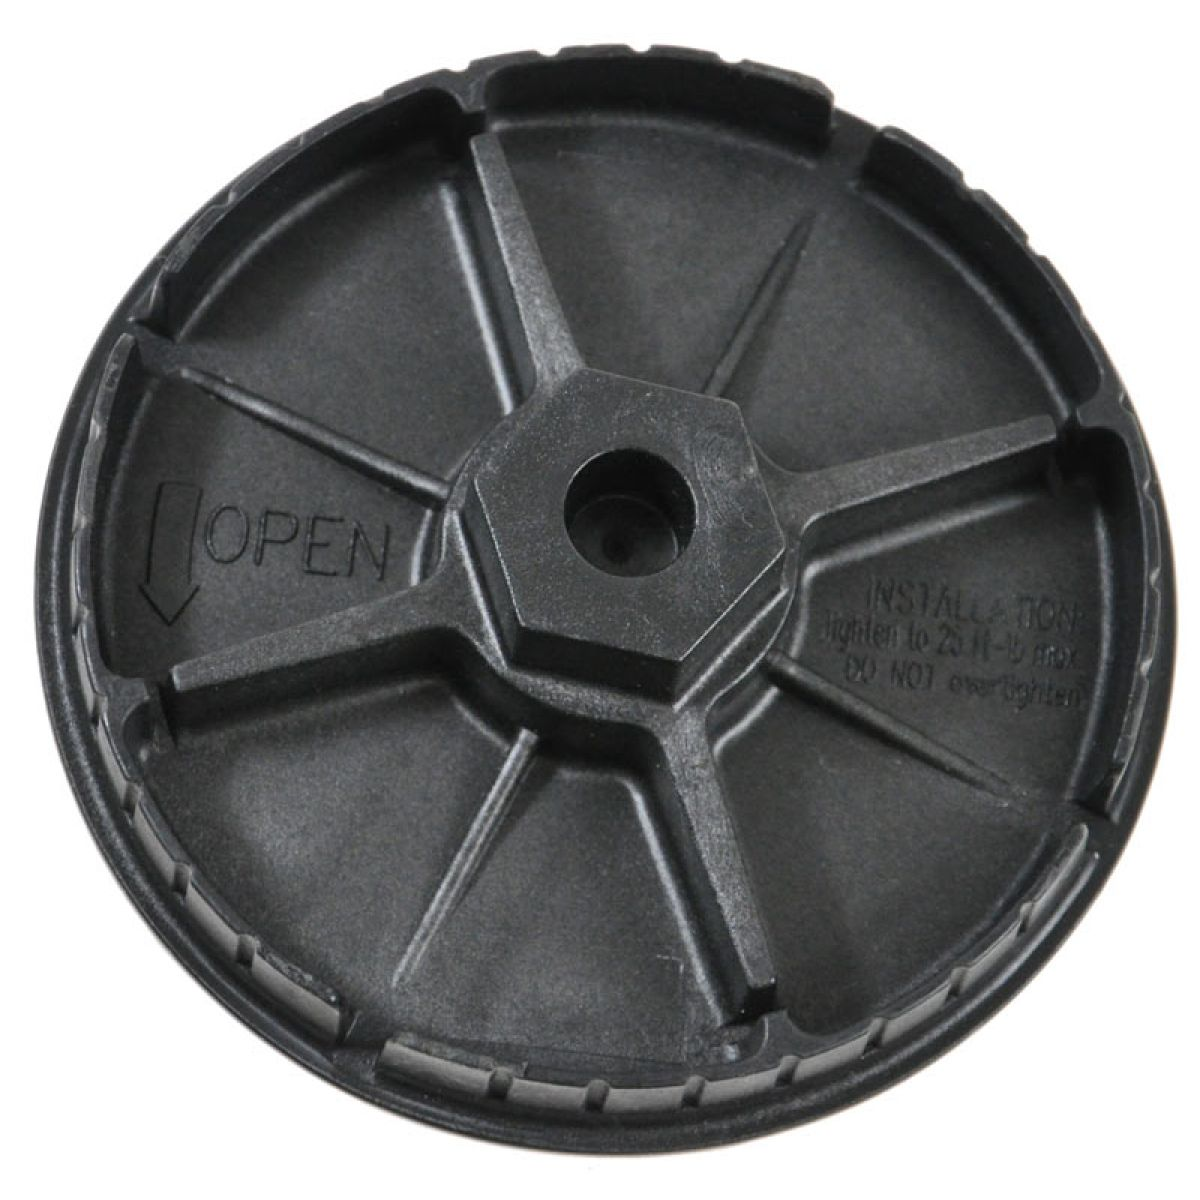 Dorman Fuel Filter Cap W Gasket For 02 06 Dodge Ram 2500 3500 59l Truck Location 59